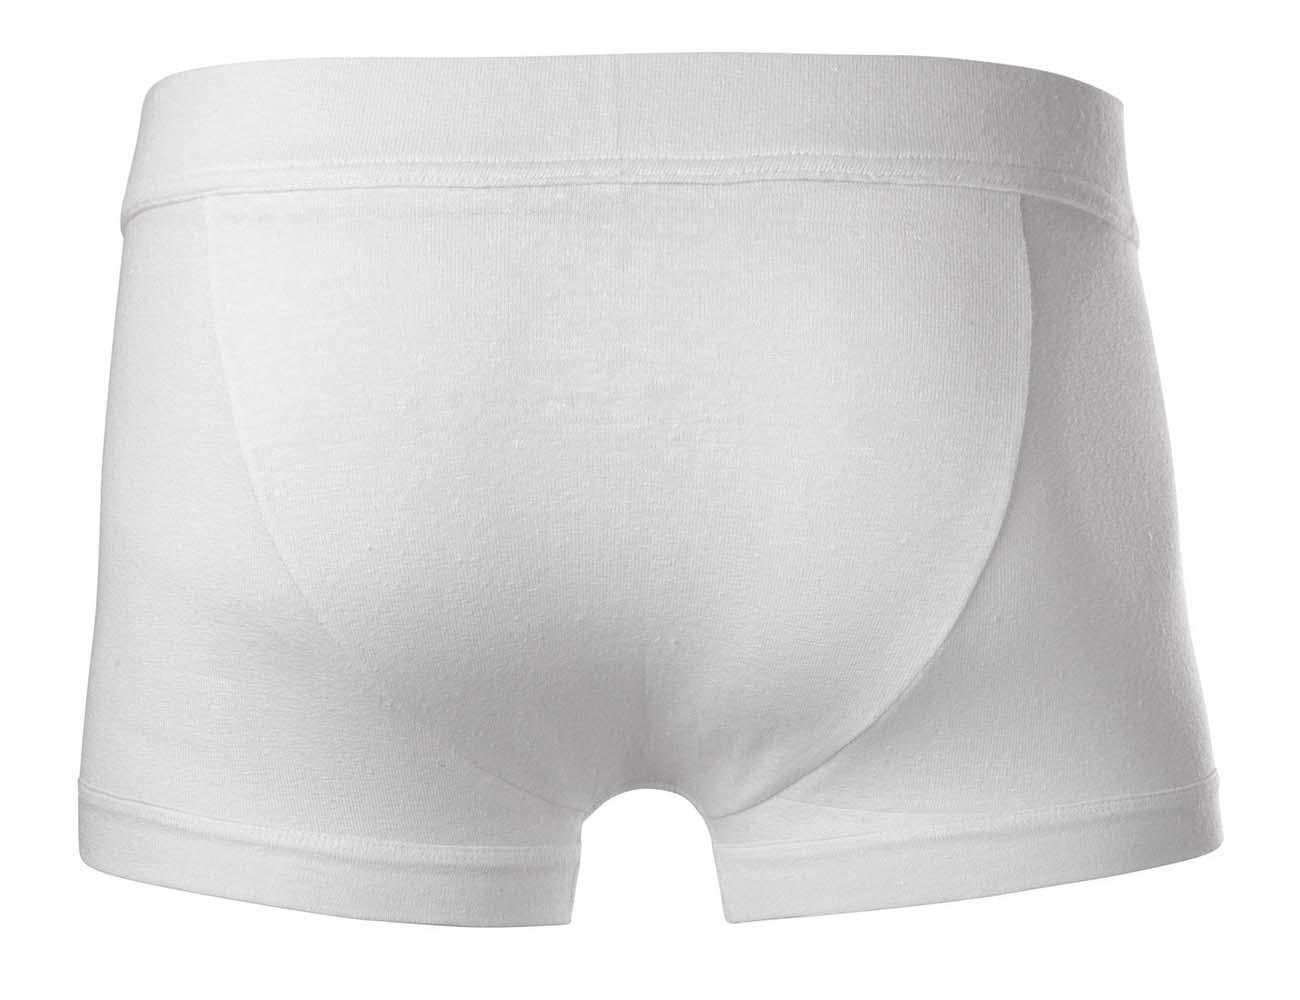 Maqoo: Underwear Revolution